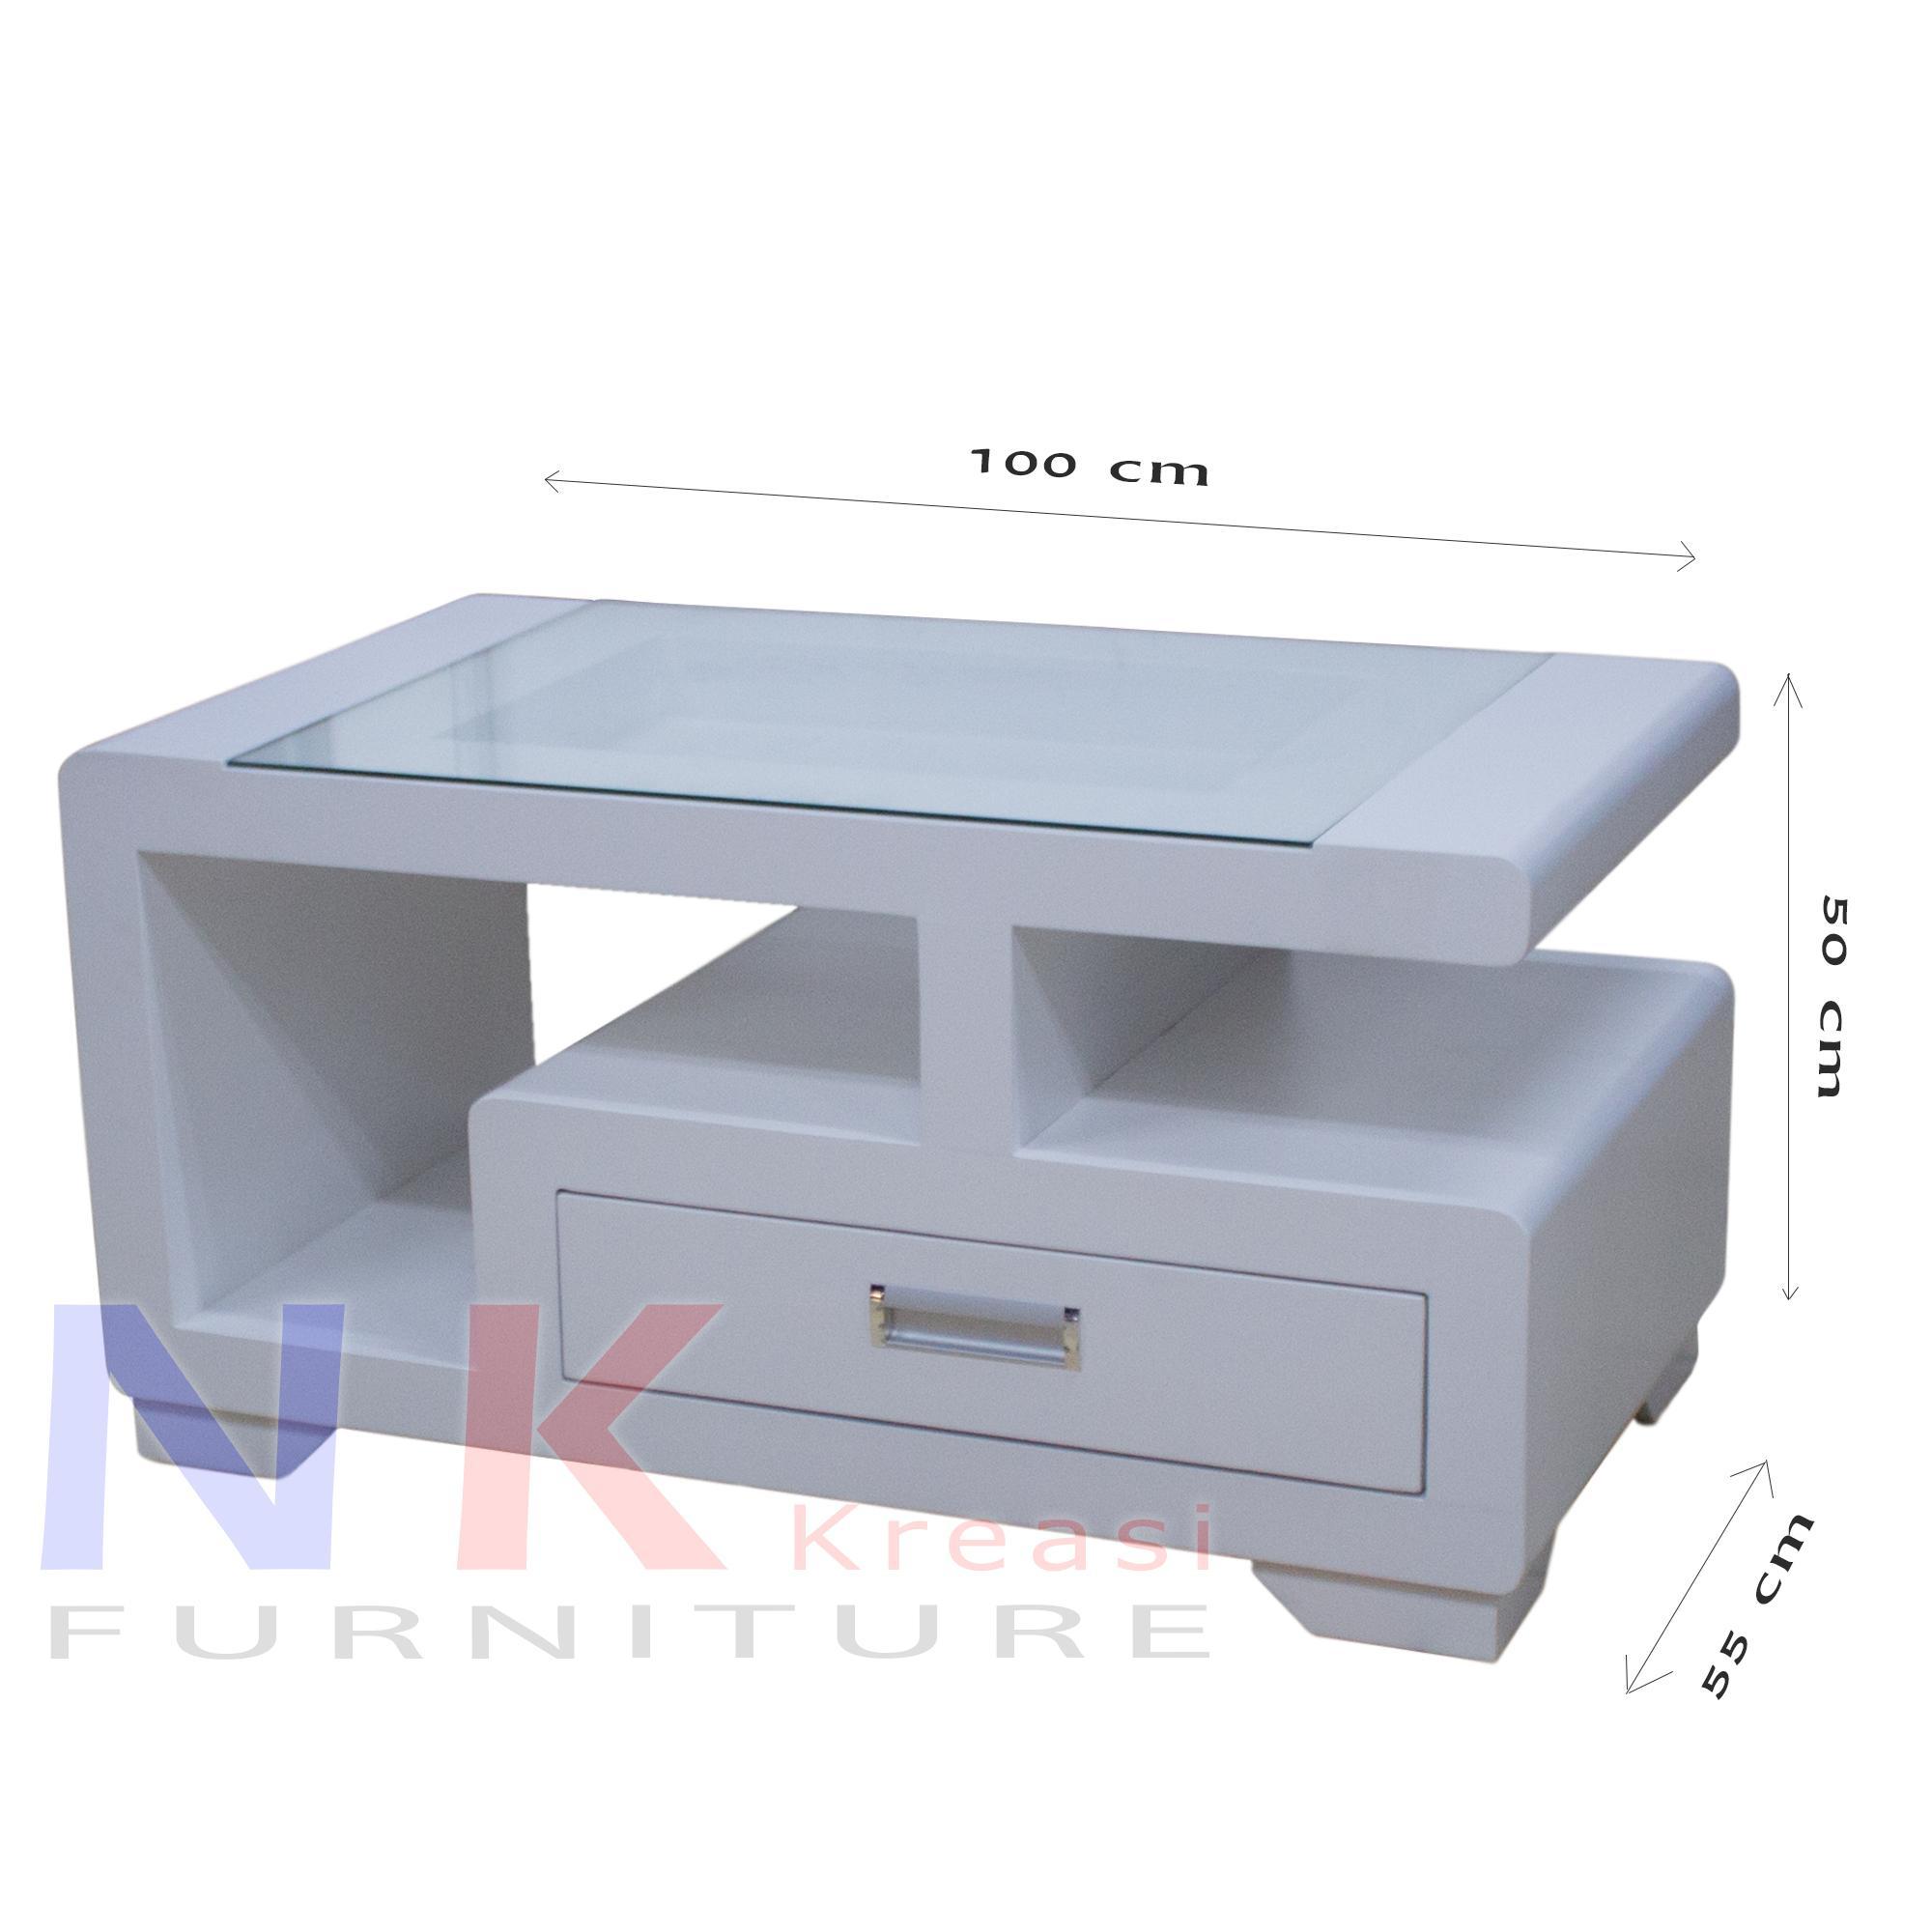 Meja Tamu Duko Putih, Meja Utama Kayu Kerang Leter G minimalis mewah - JABODETABEK ONLY